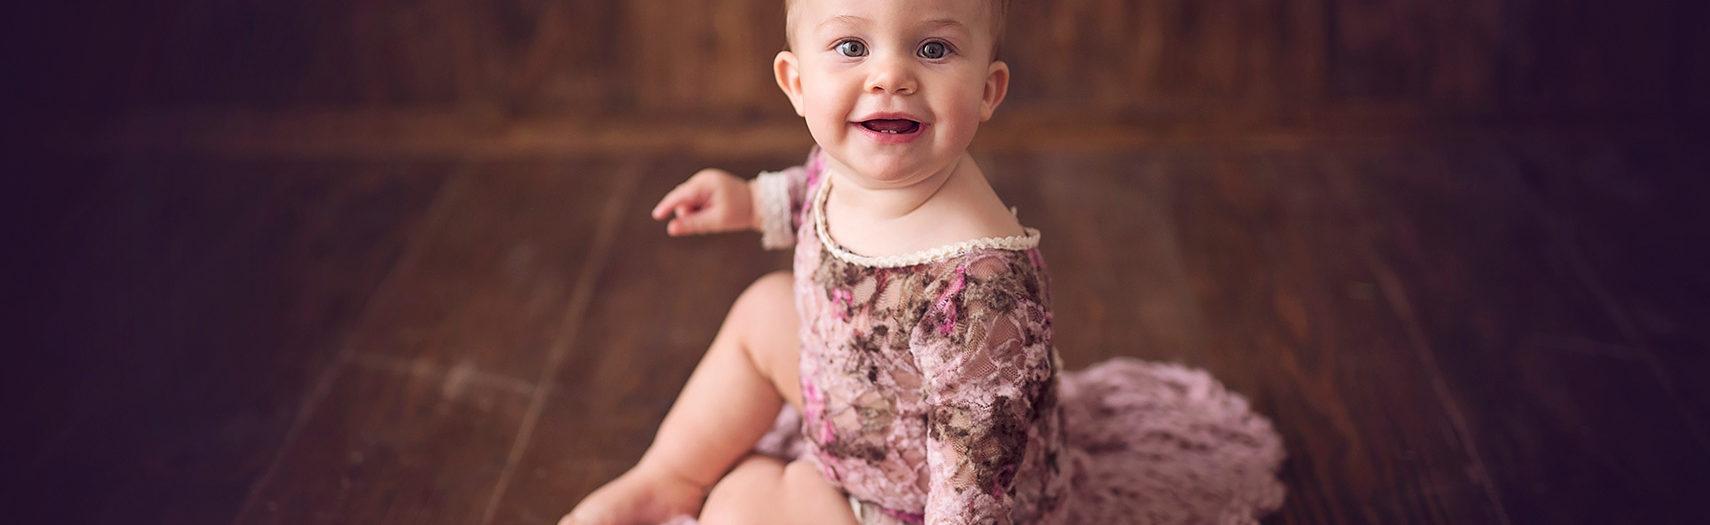 Sofia, 10 mesi